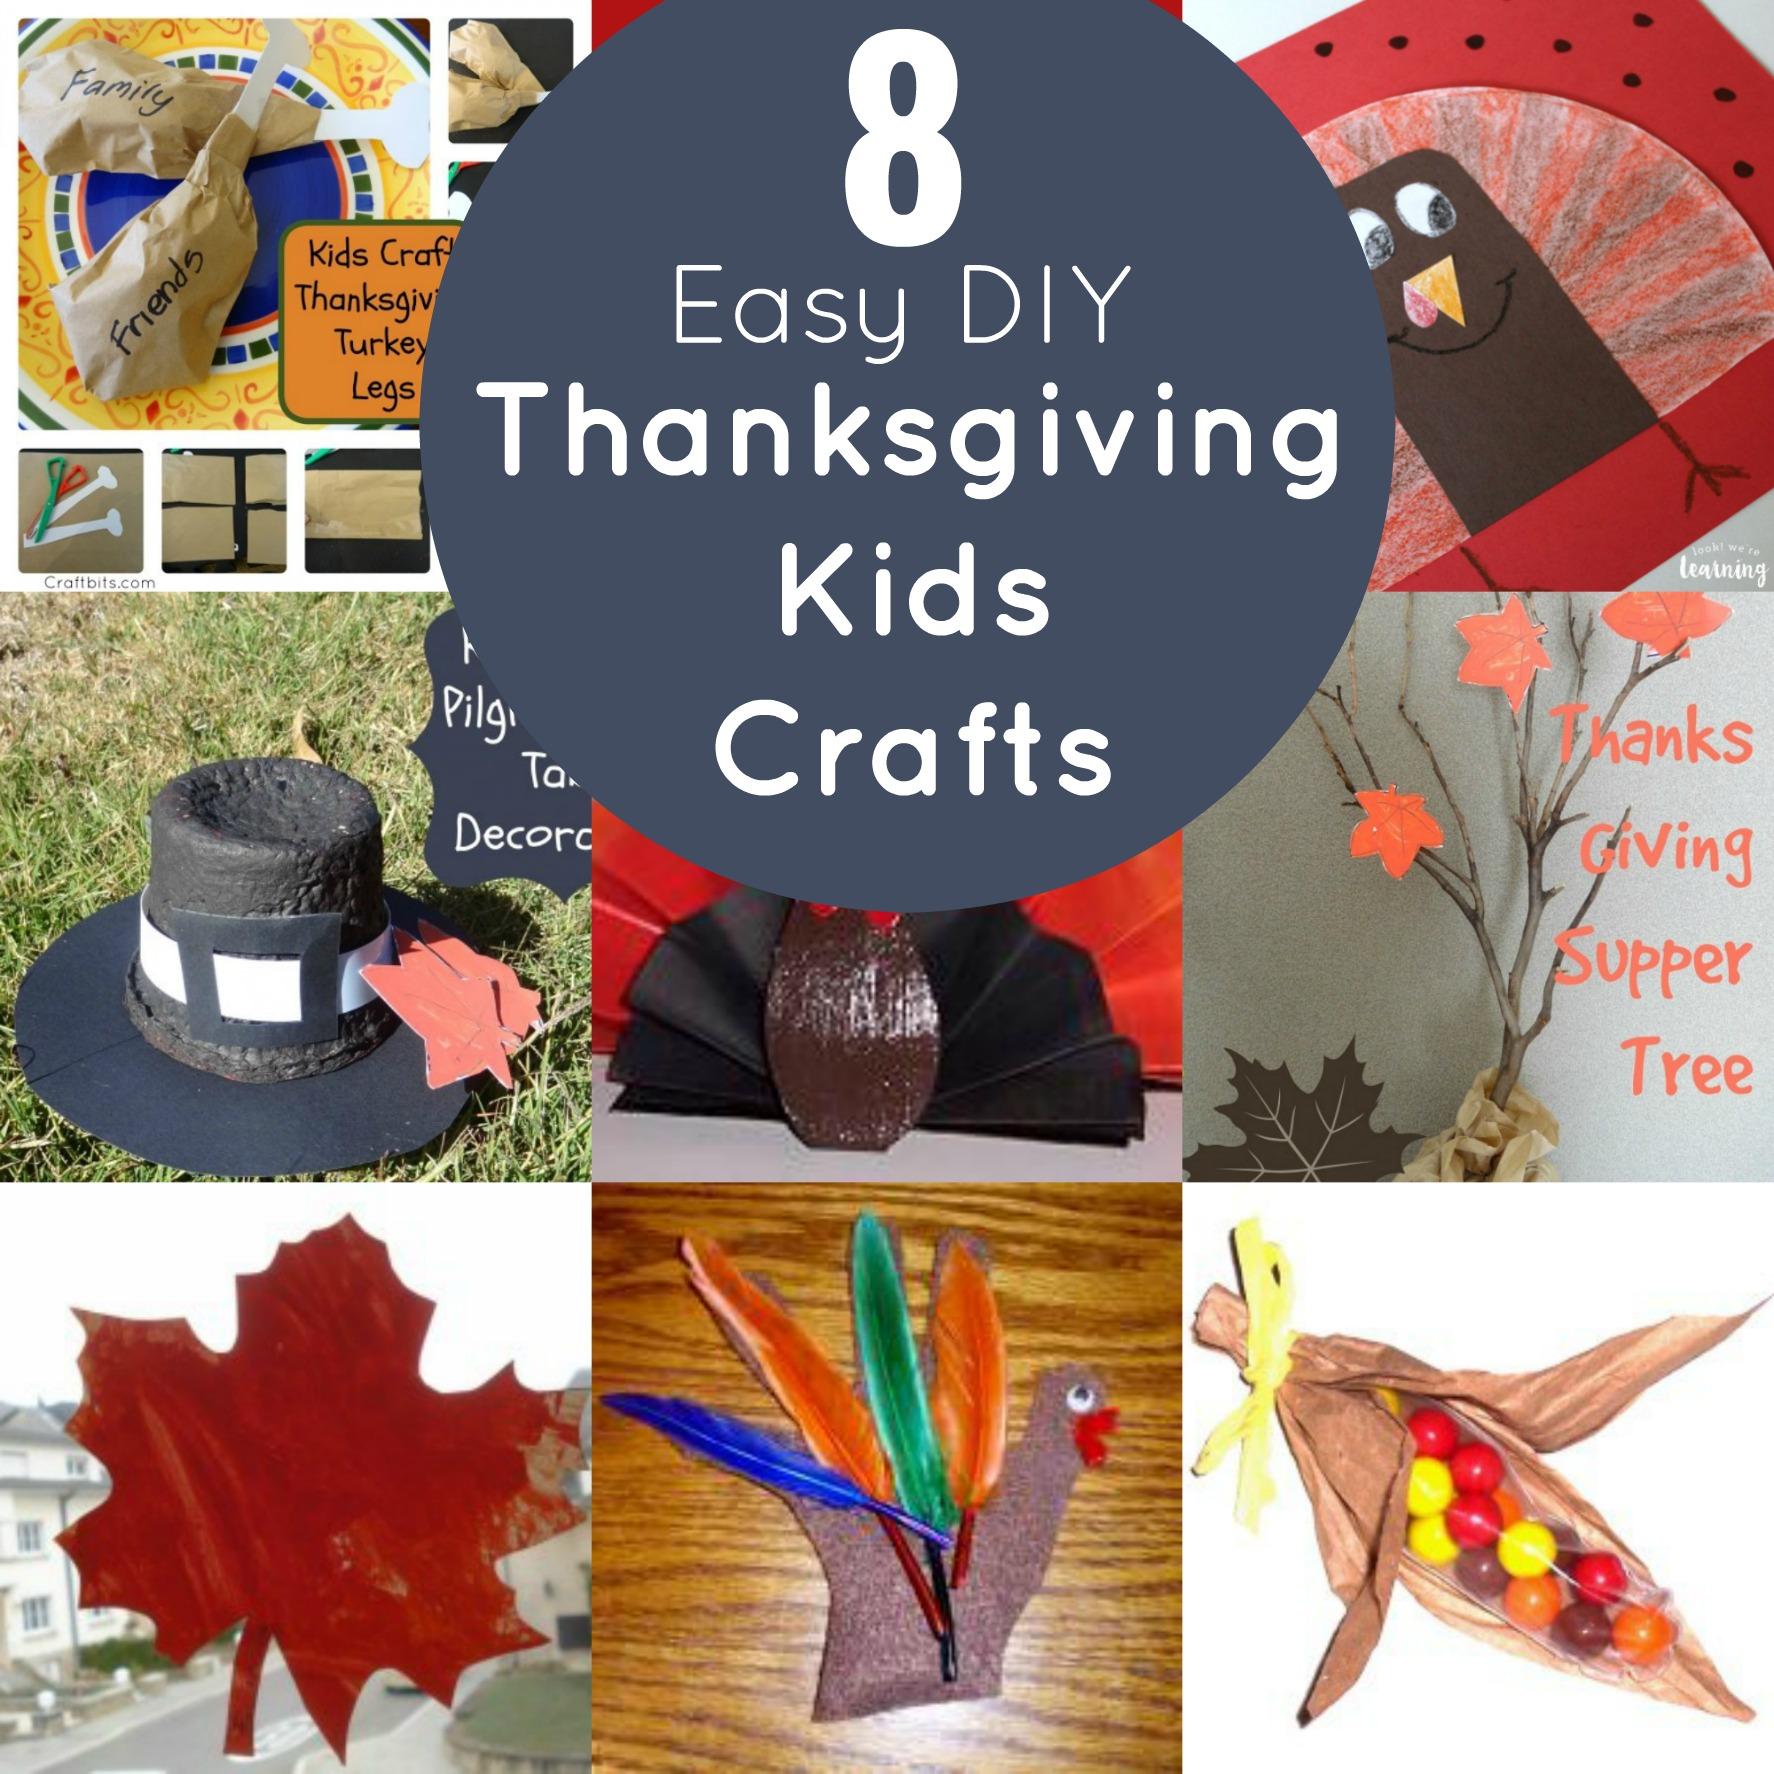 8 easy diy thanksgiving kids crafts mommies reviews for Easy diy thanksgiving crafts